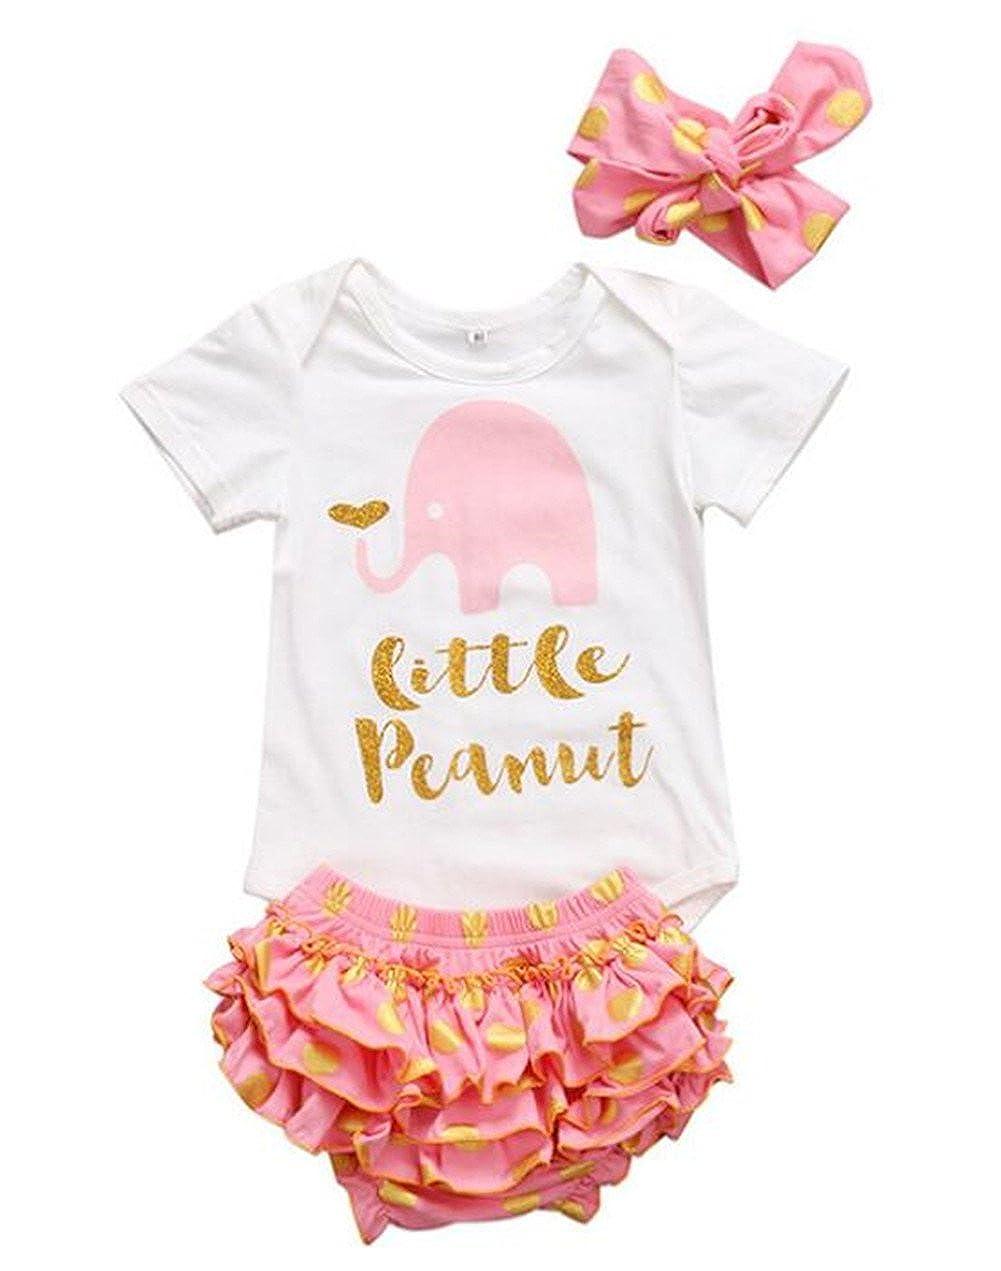 SUPEYA Baby Girls Letter Print Short Sleeve Romper Tops+Polka Dot Shorts+Headband Set